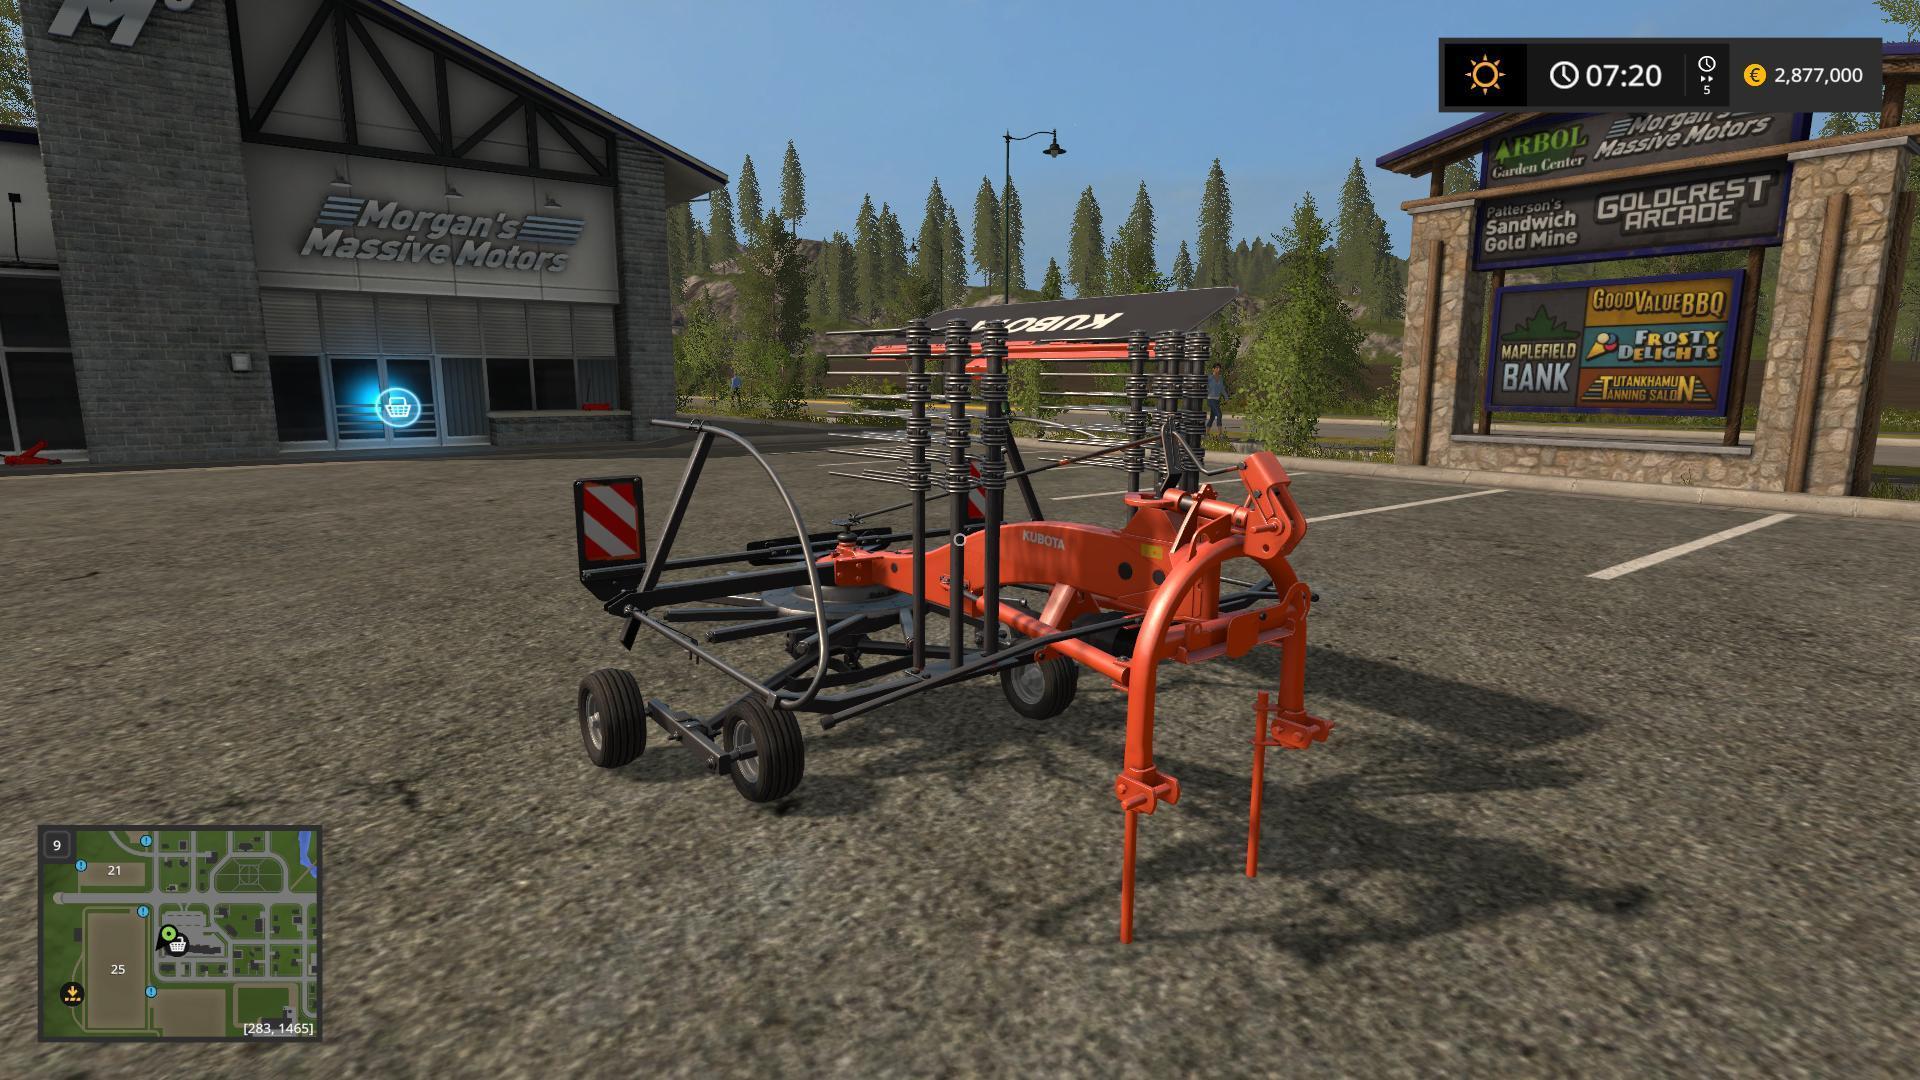 KUBOTA RA 1043 V1.1.0 FS17 - Farming Simulator 17 mod / FS 2017 mod